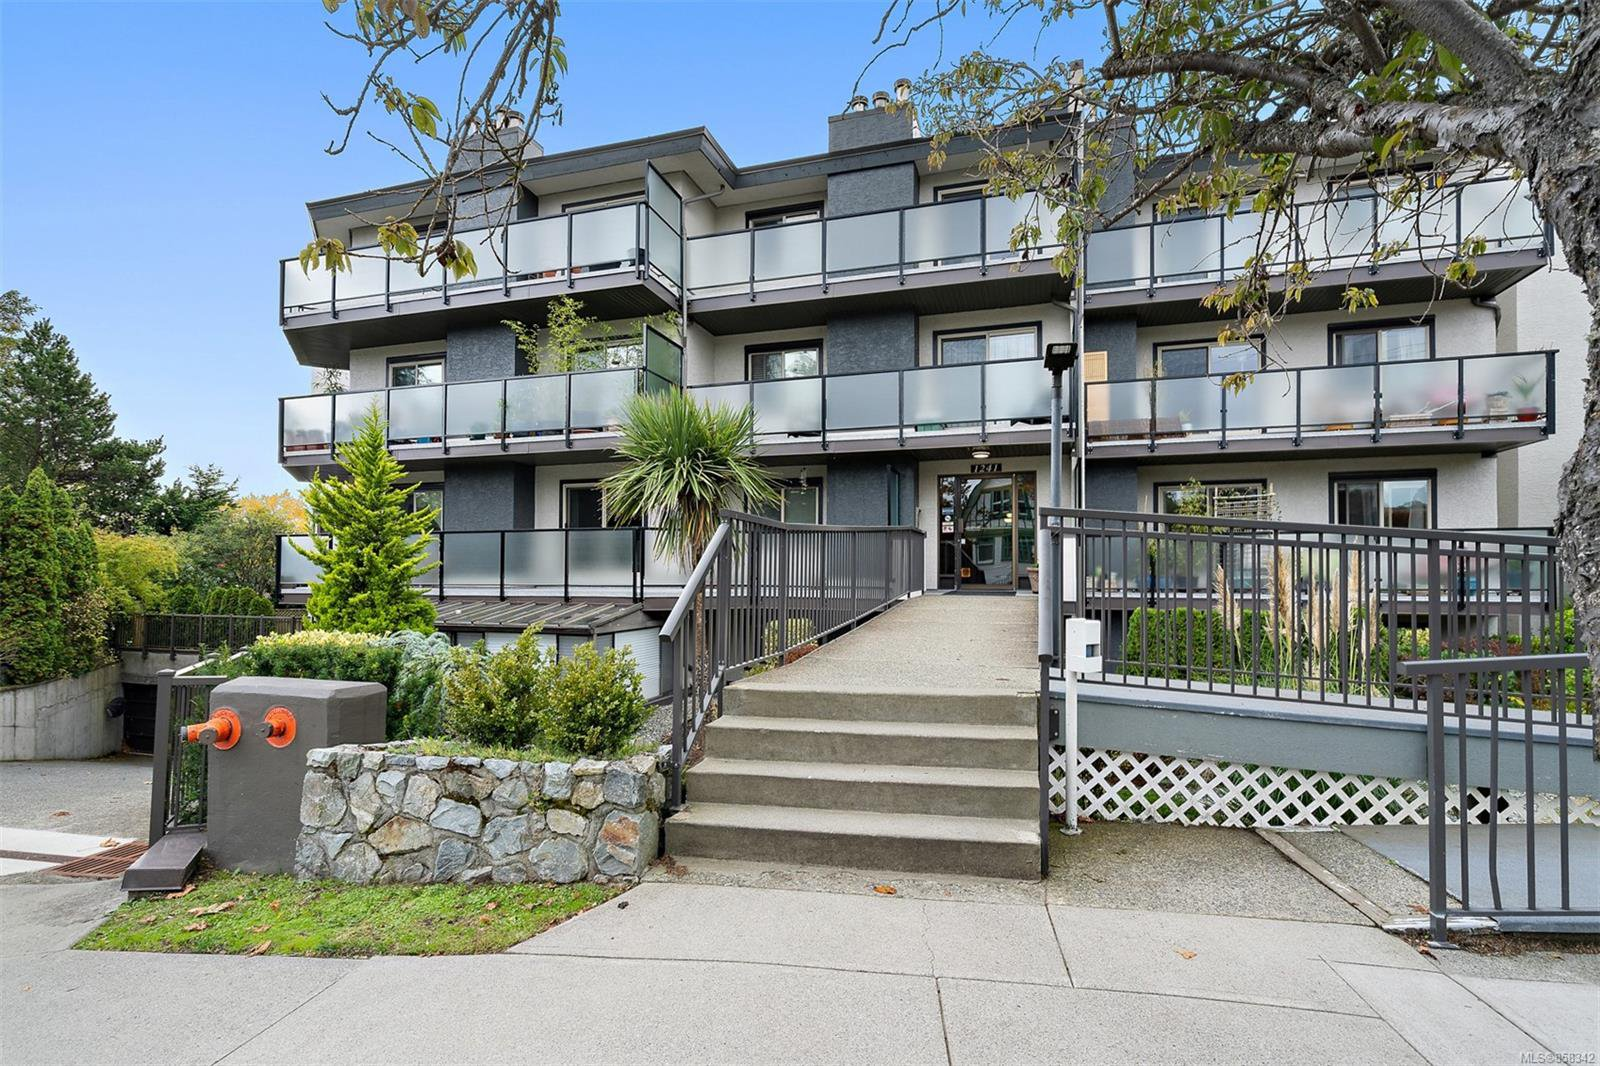 Main Photo: 206 1241 Fairfield Rd in : Vi Fairfield West Condo for sale (Victoria)  : MLS®# 858342